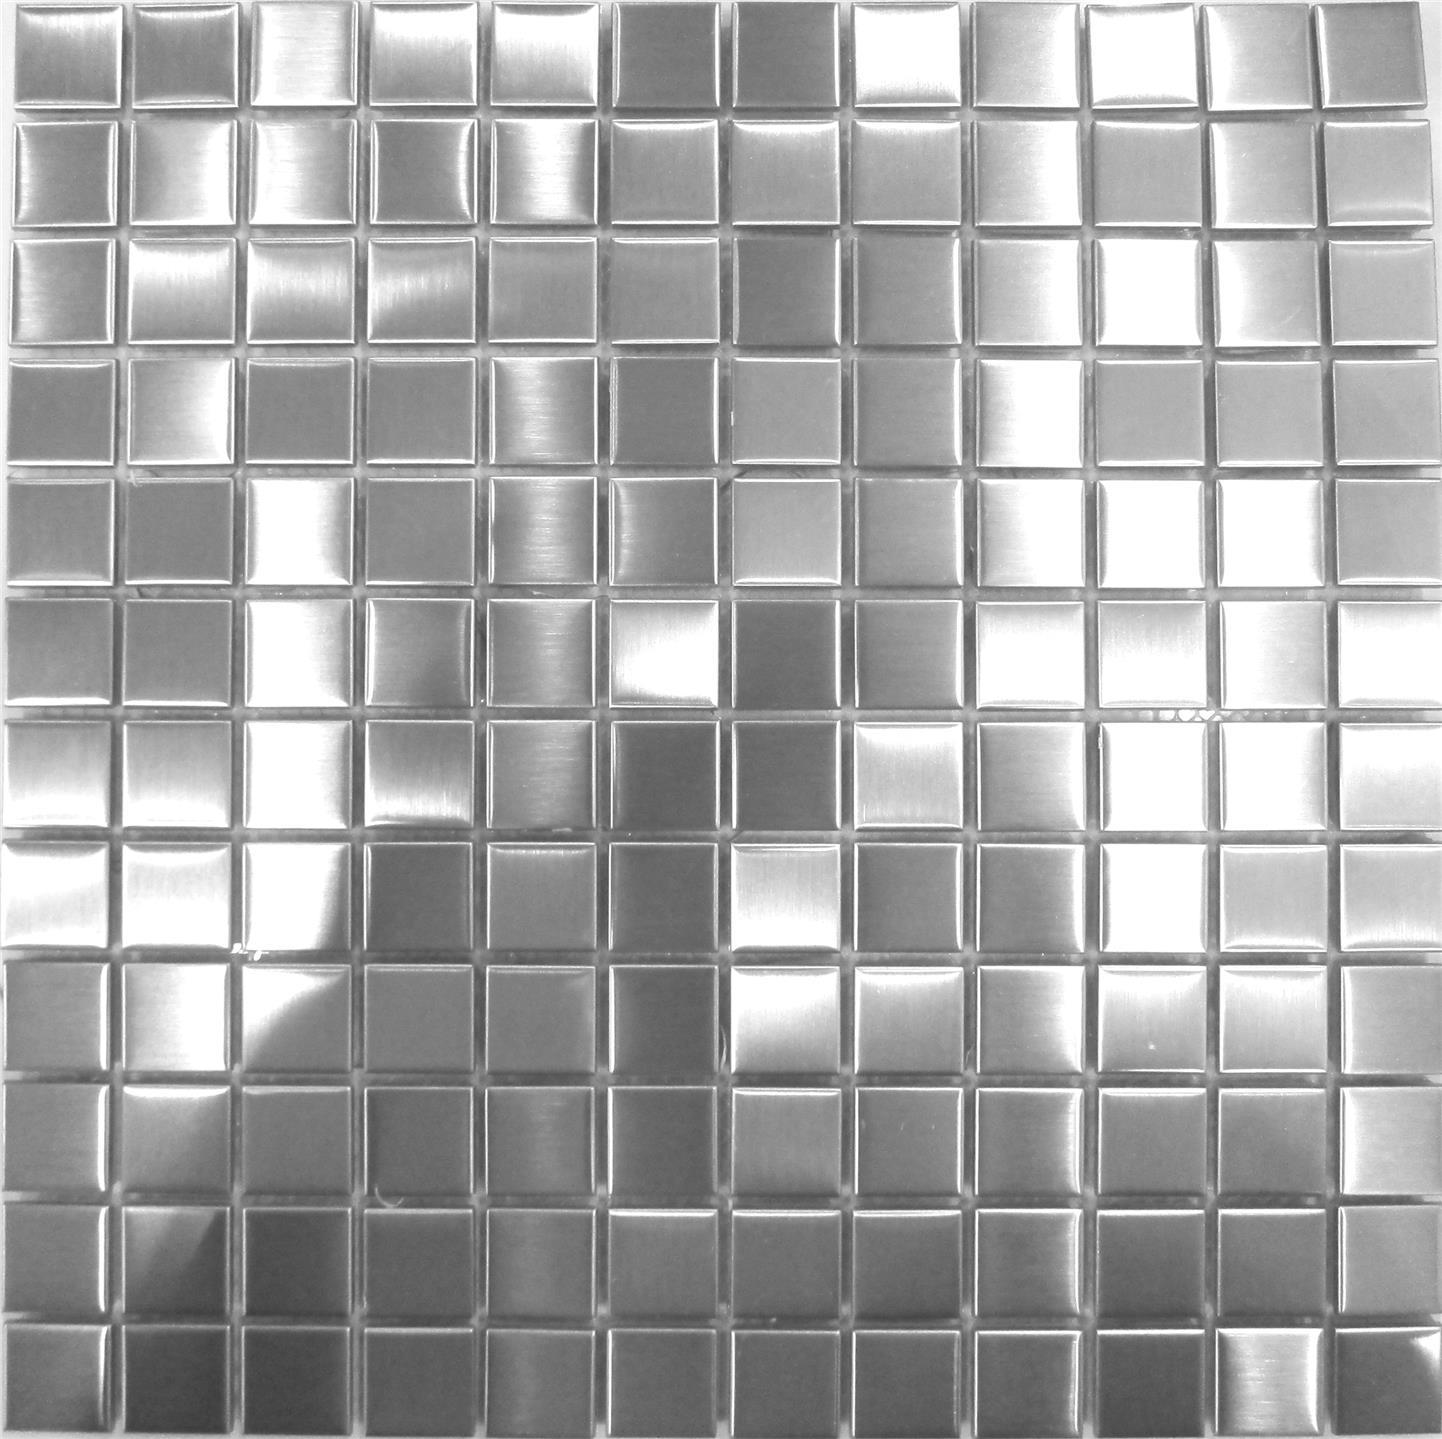 Brushed Stainless Steel Metal Mosaic Wall Tiles Bathroom Kitchen Sheet Mt0036 Ebay